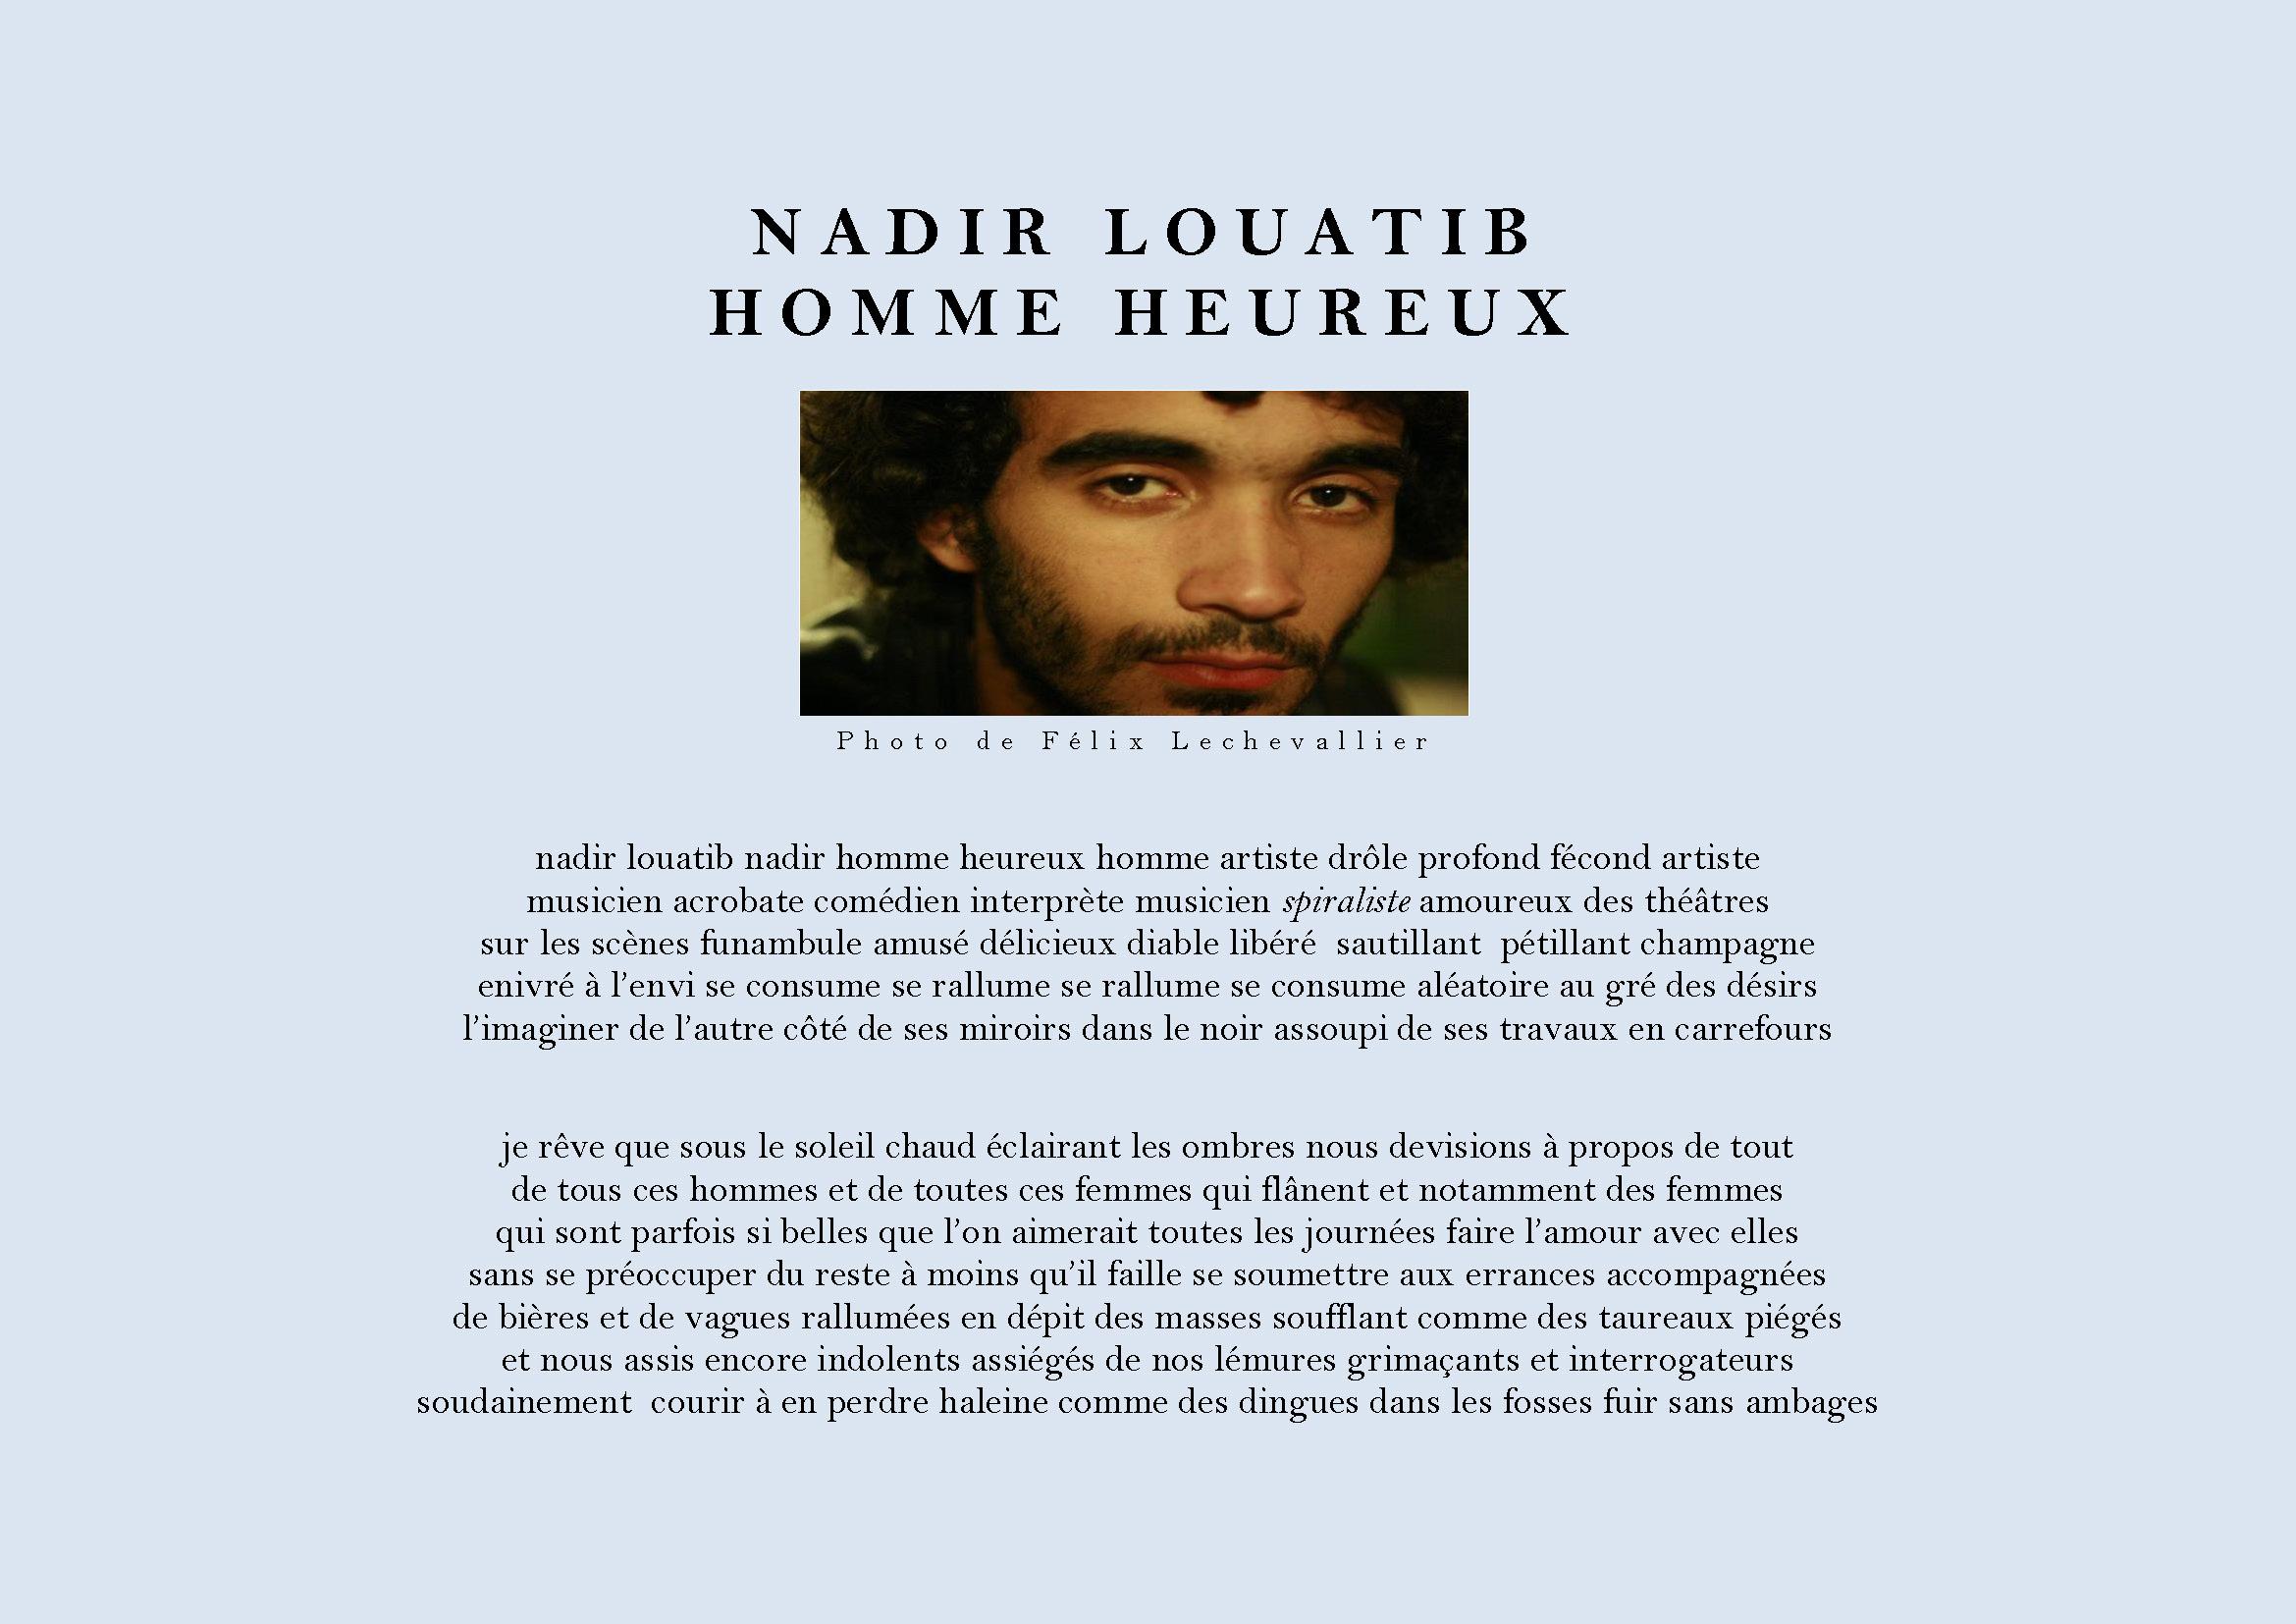 Nadir Louatib homme heureux jocelyn brudey juillet 2013_Page_1